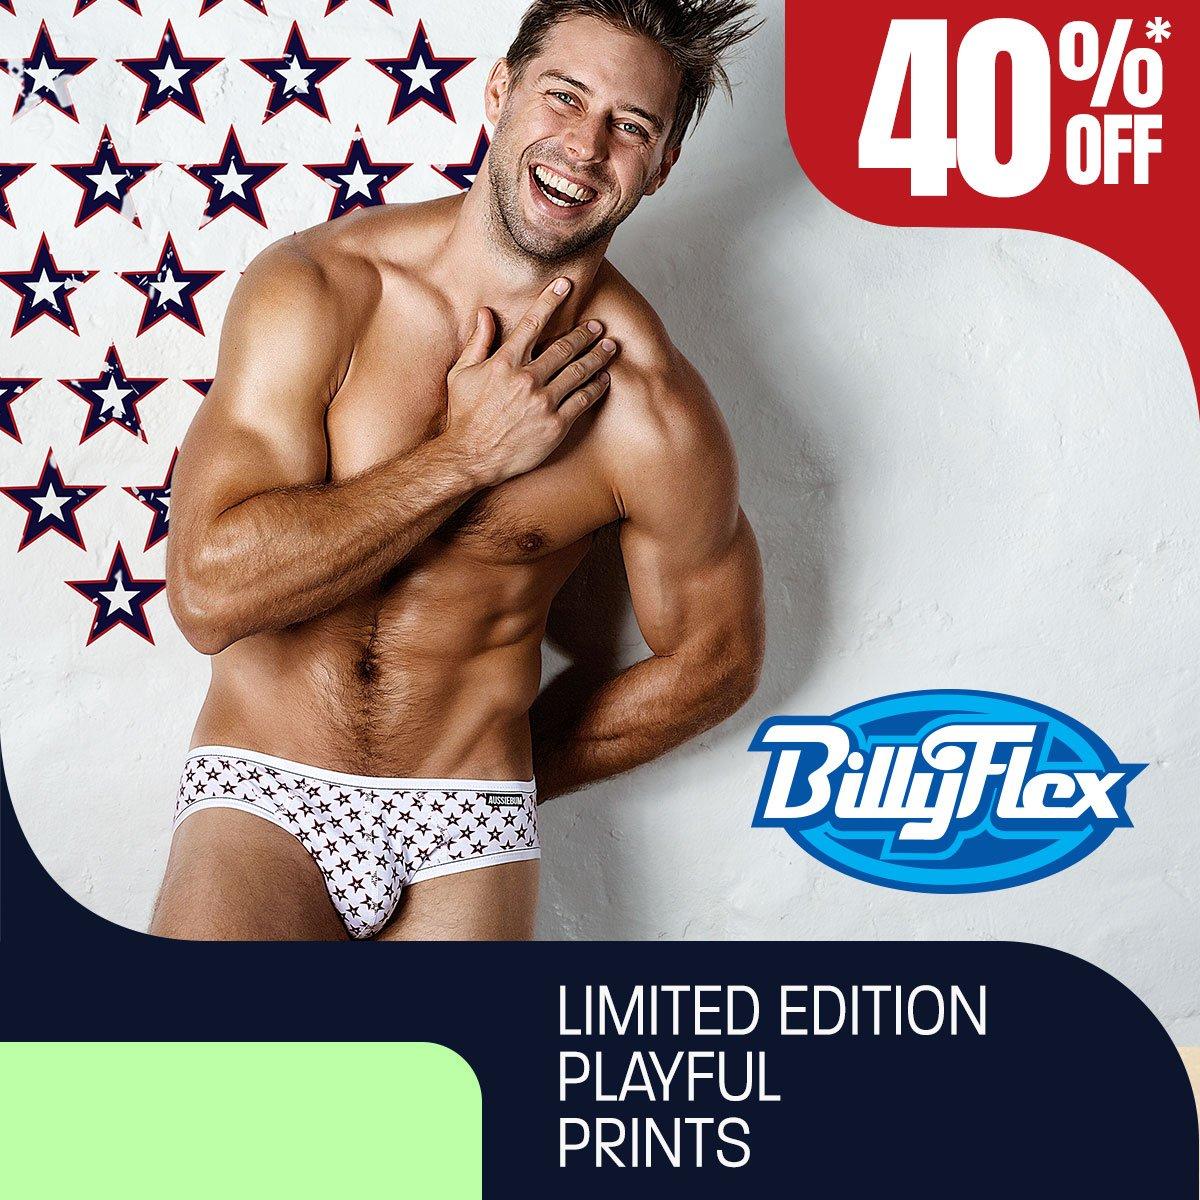 Billy Flex USA Homepage Image